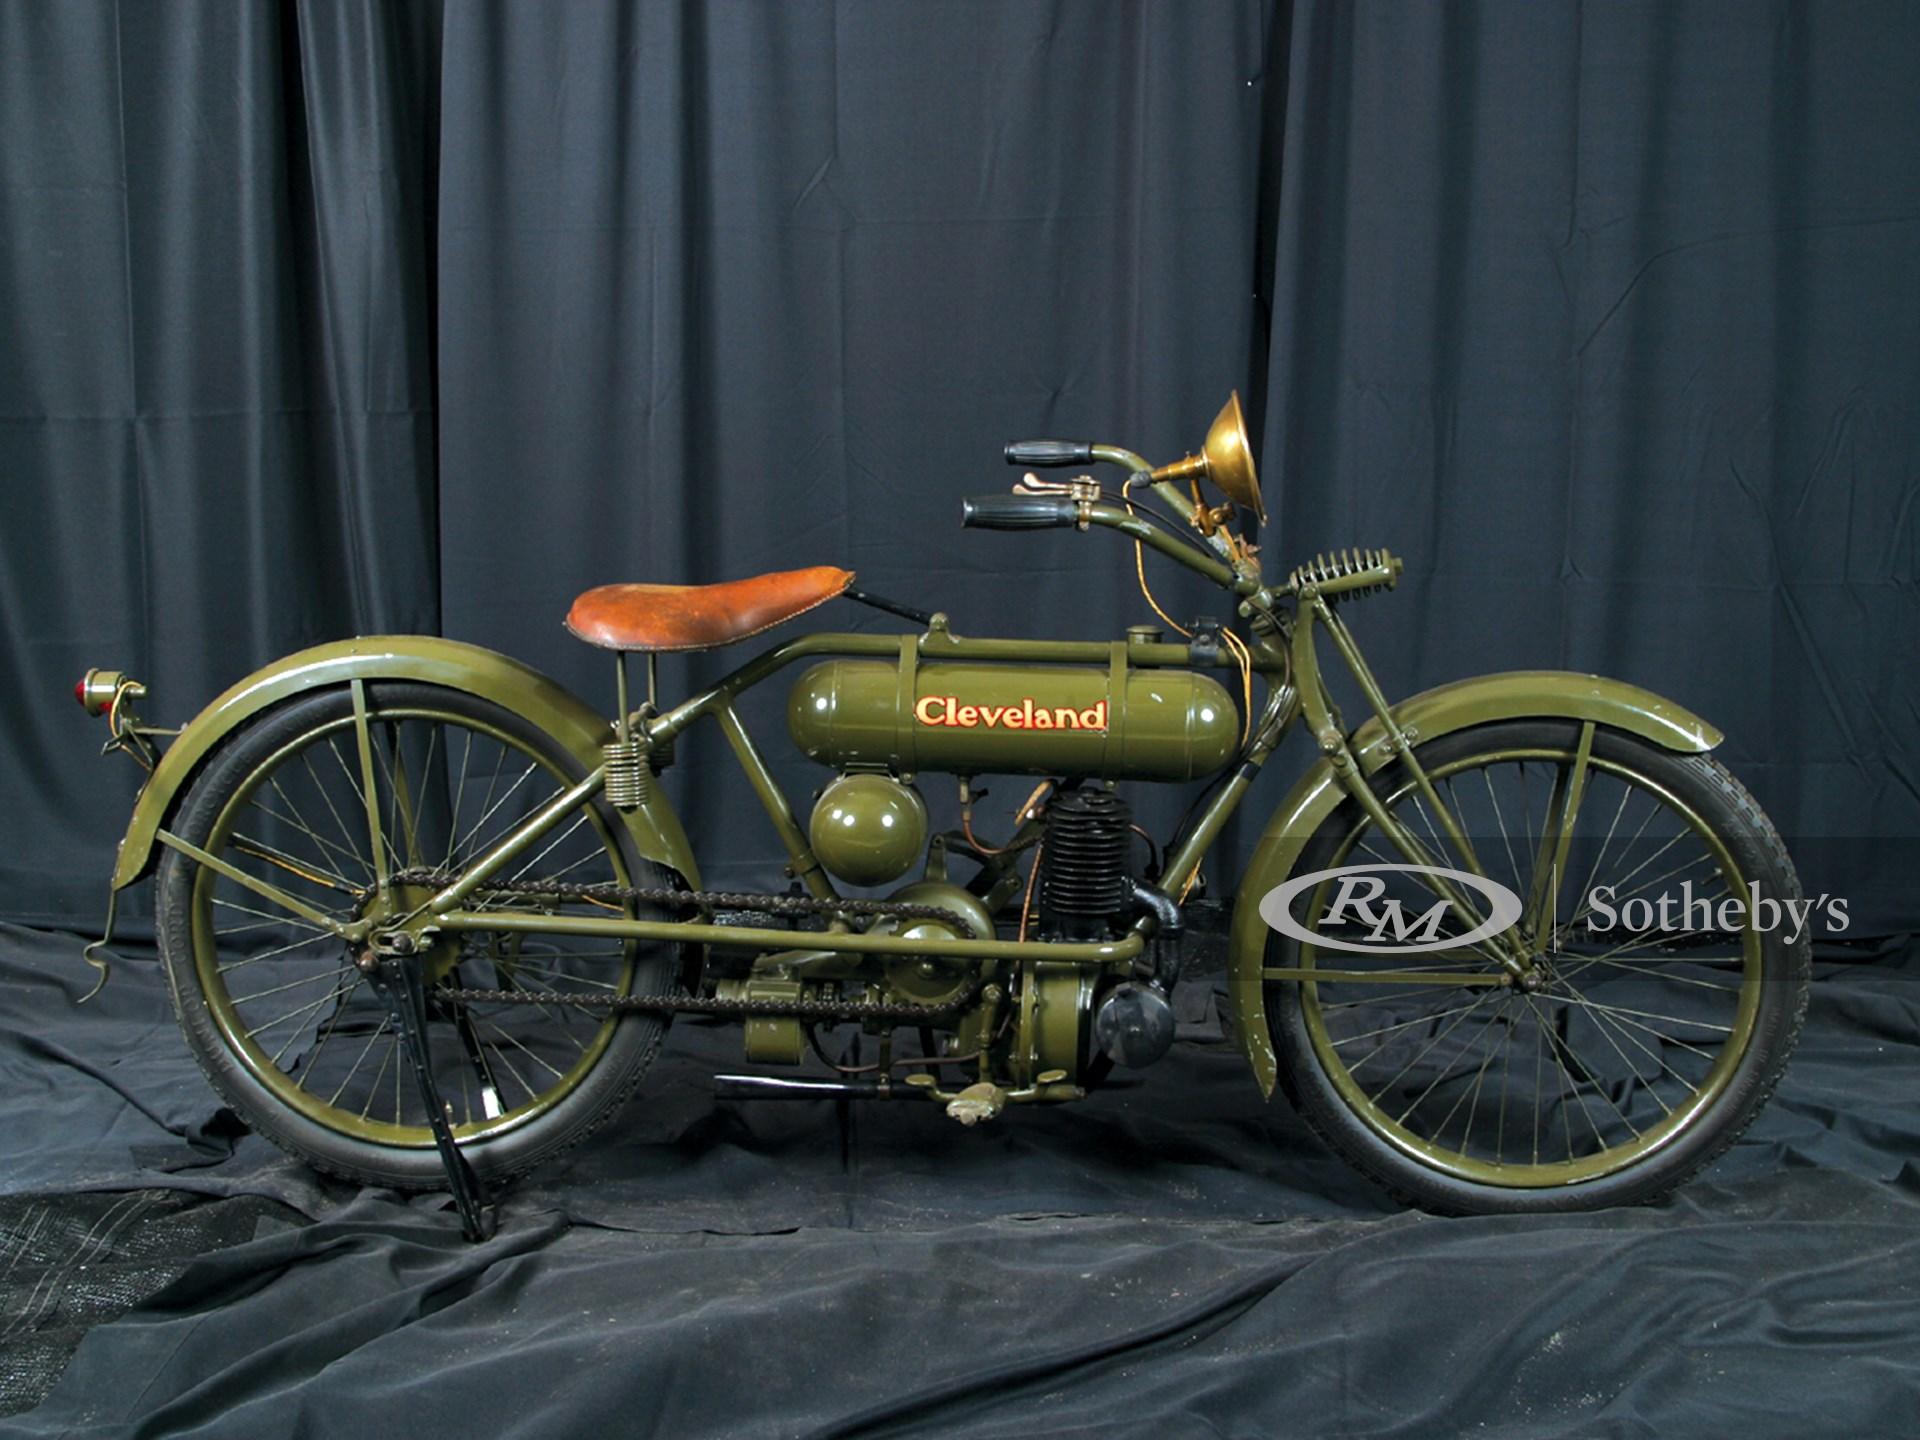 1916 Cleveland SingleCylinder Motorcycle